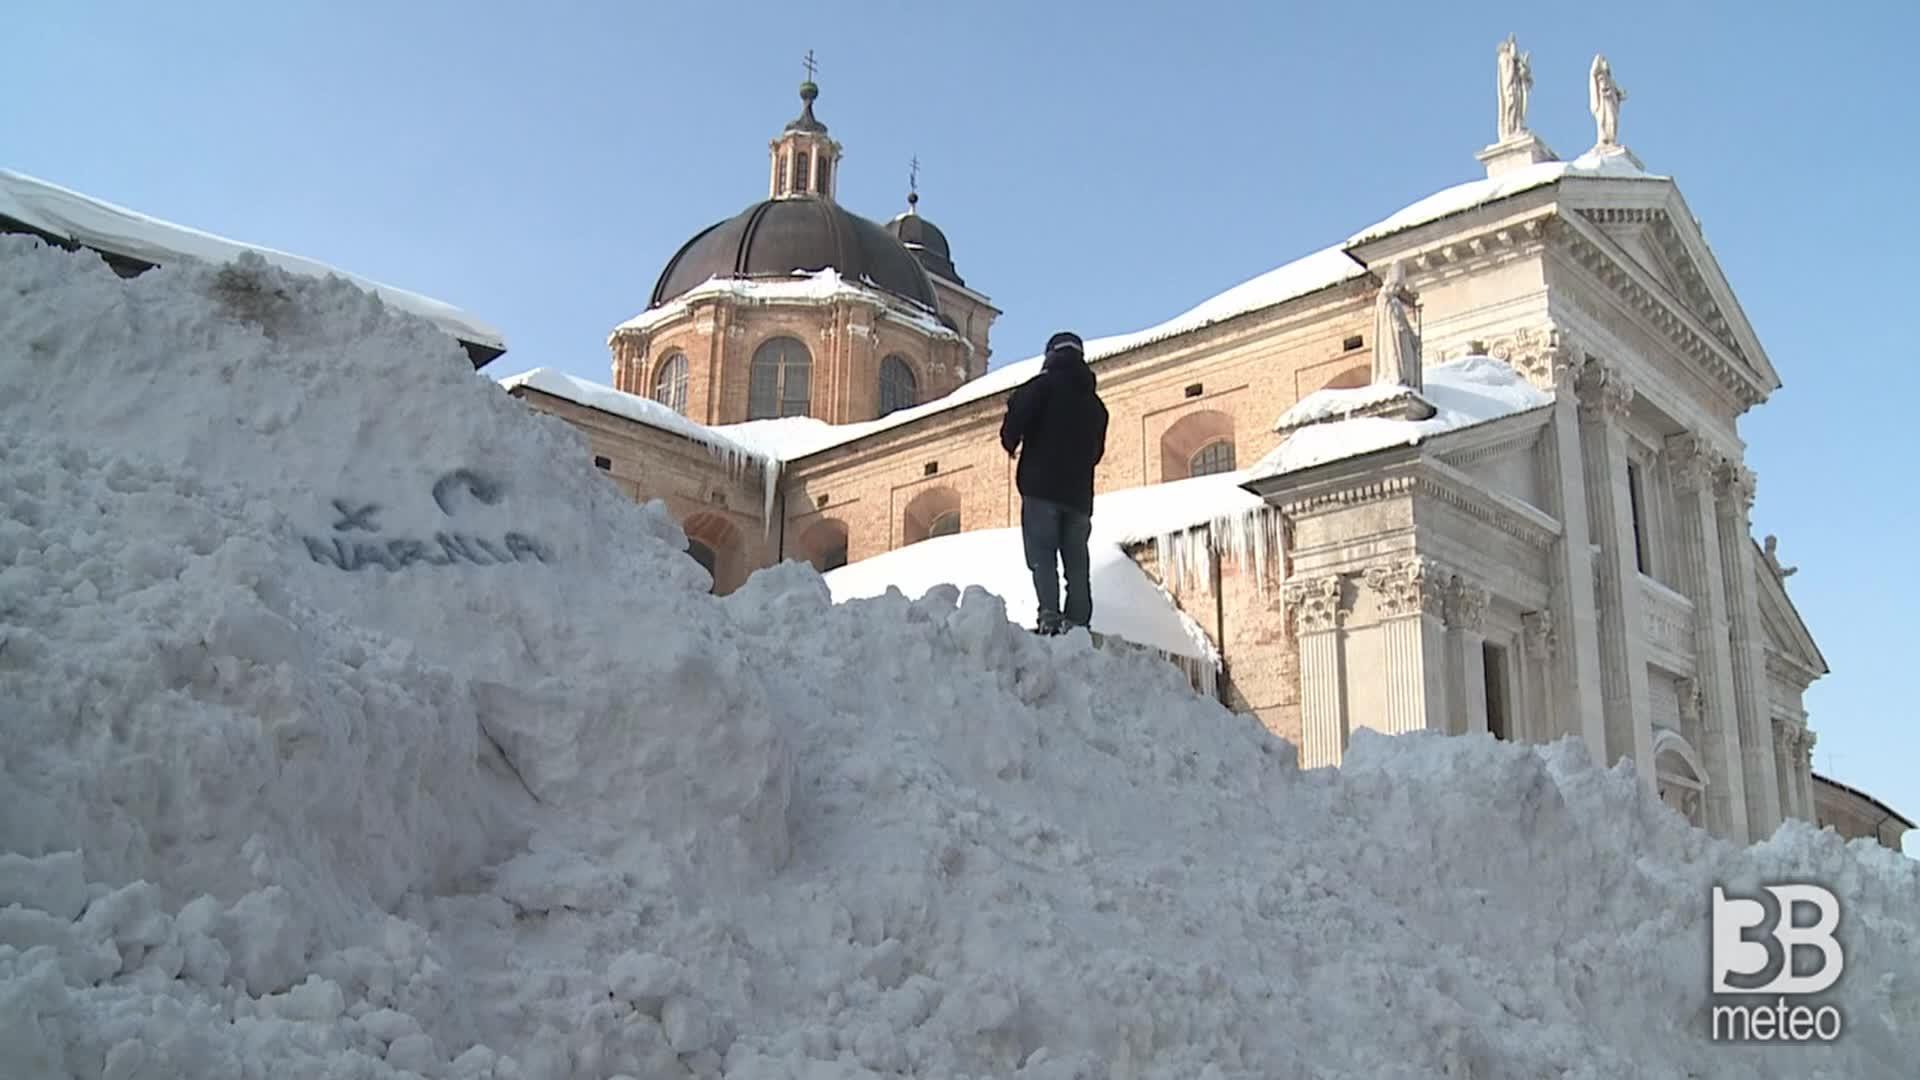 2012, Urbino sommersa dalla neve: i giorni dell'emergenza